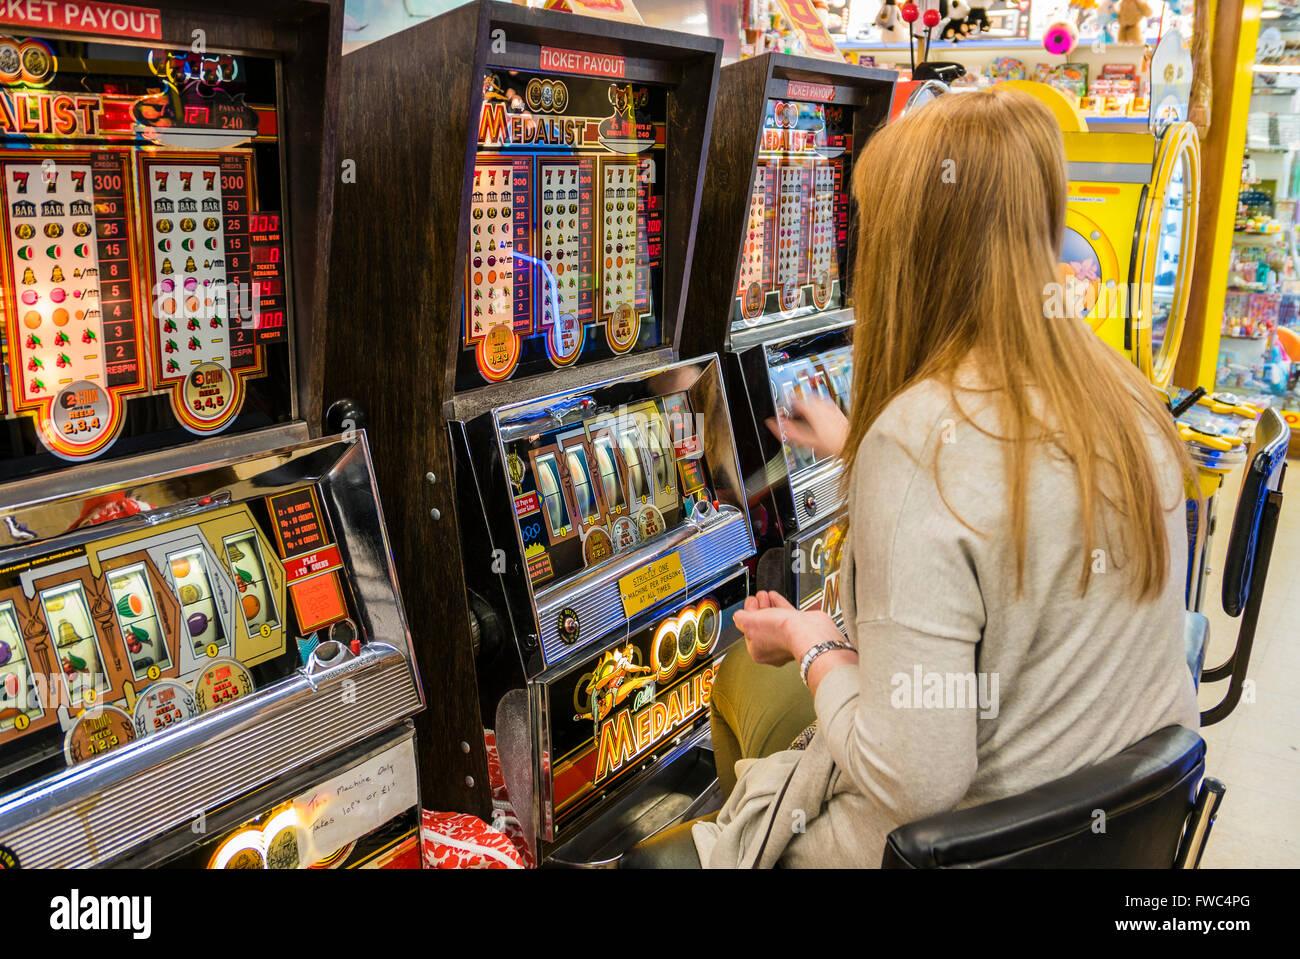 A woman plays a 2p slot machine in a funfair at a British ...